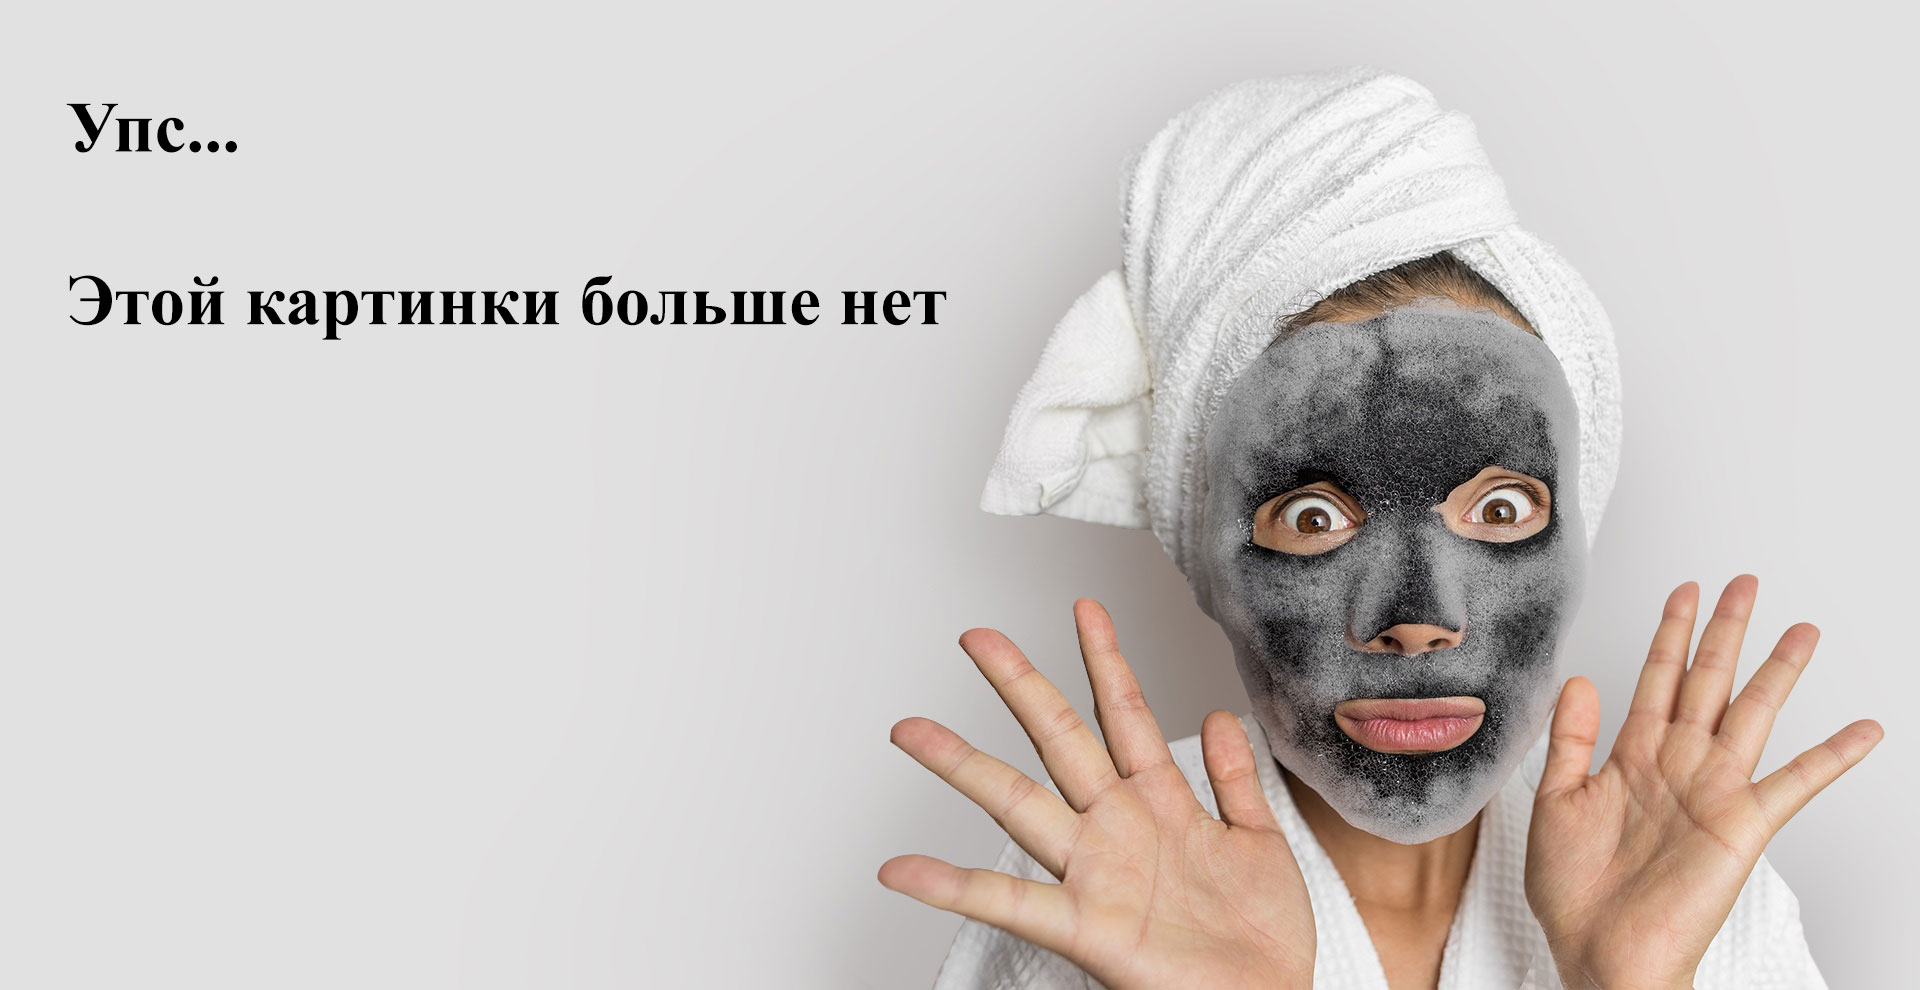 Patrisa Nail, Акриловая пудра, прозрачная, 40 г